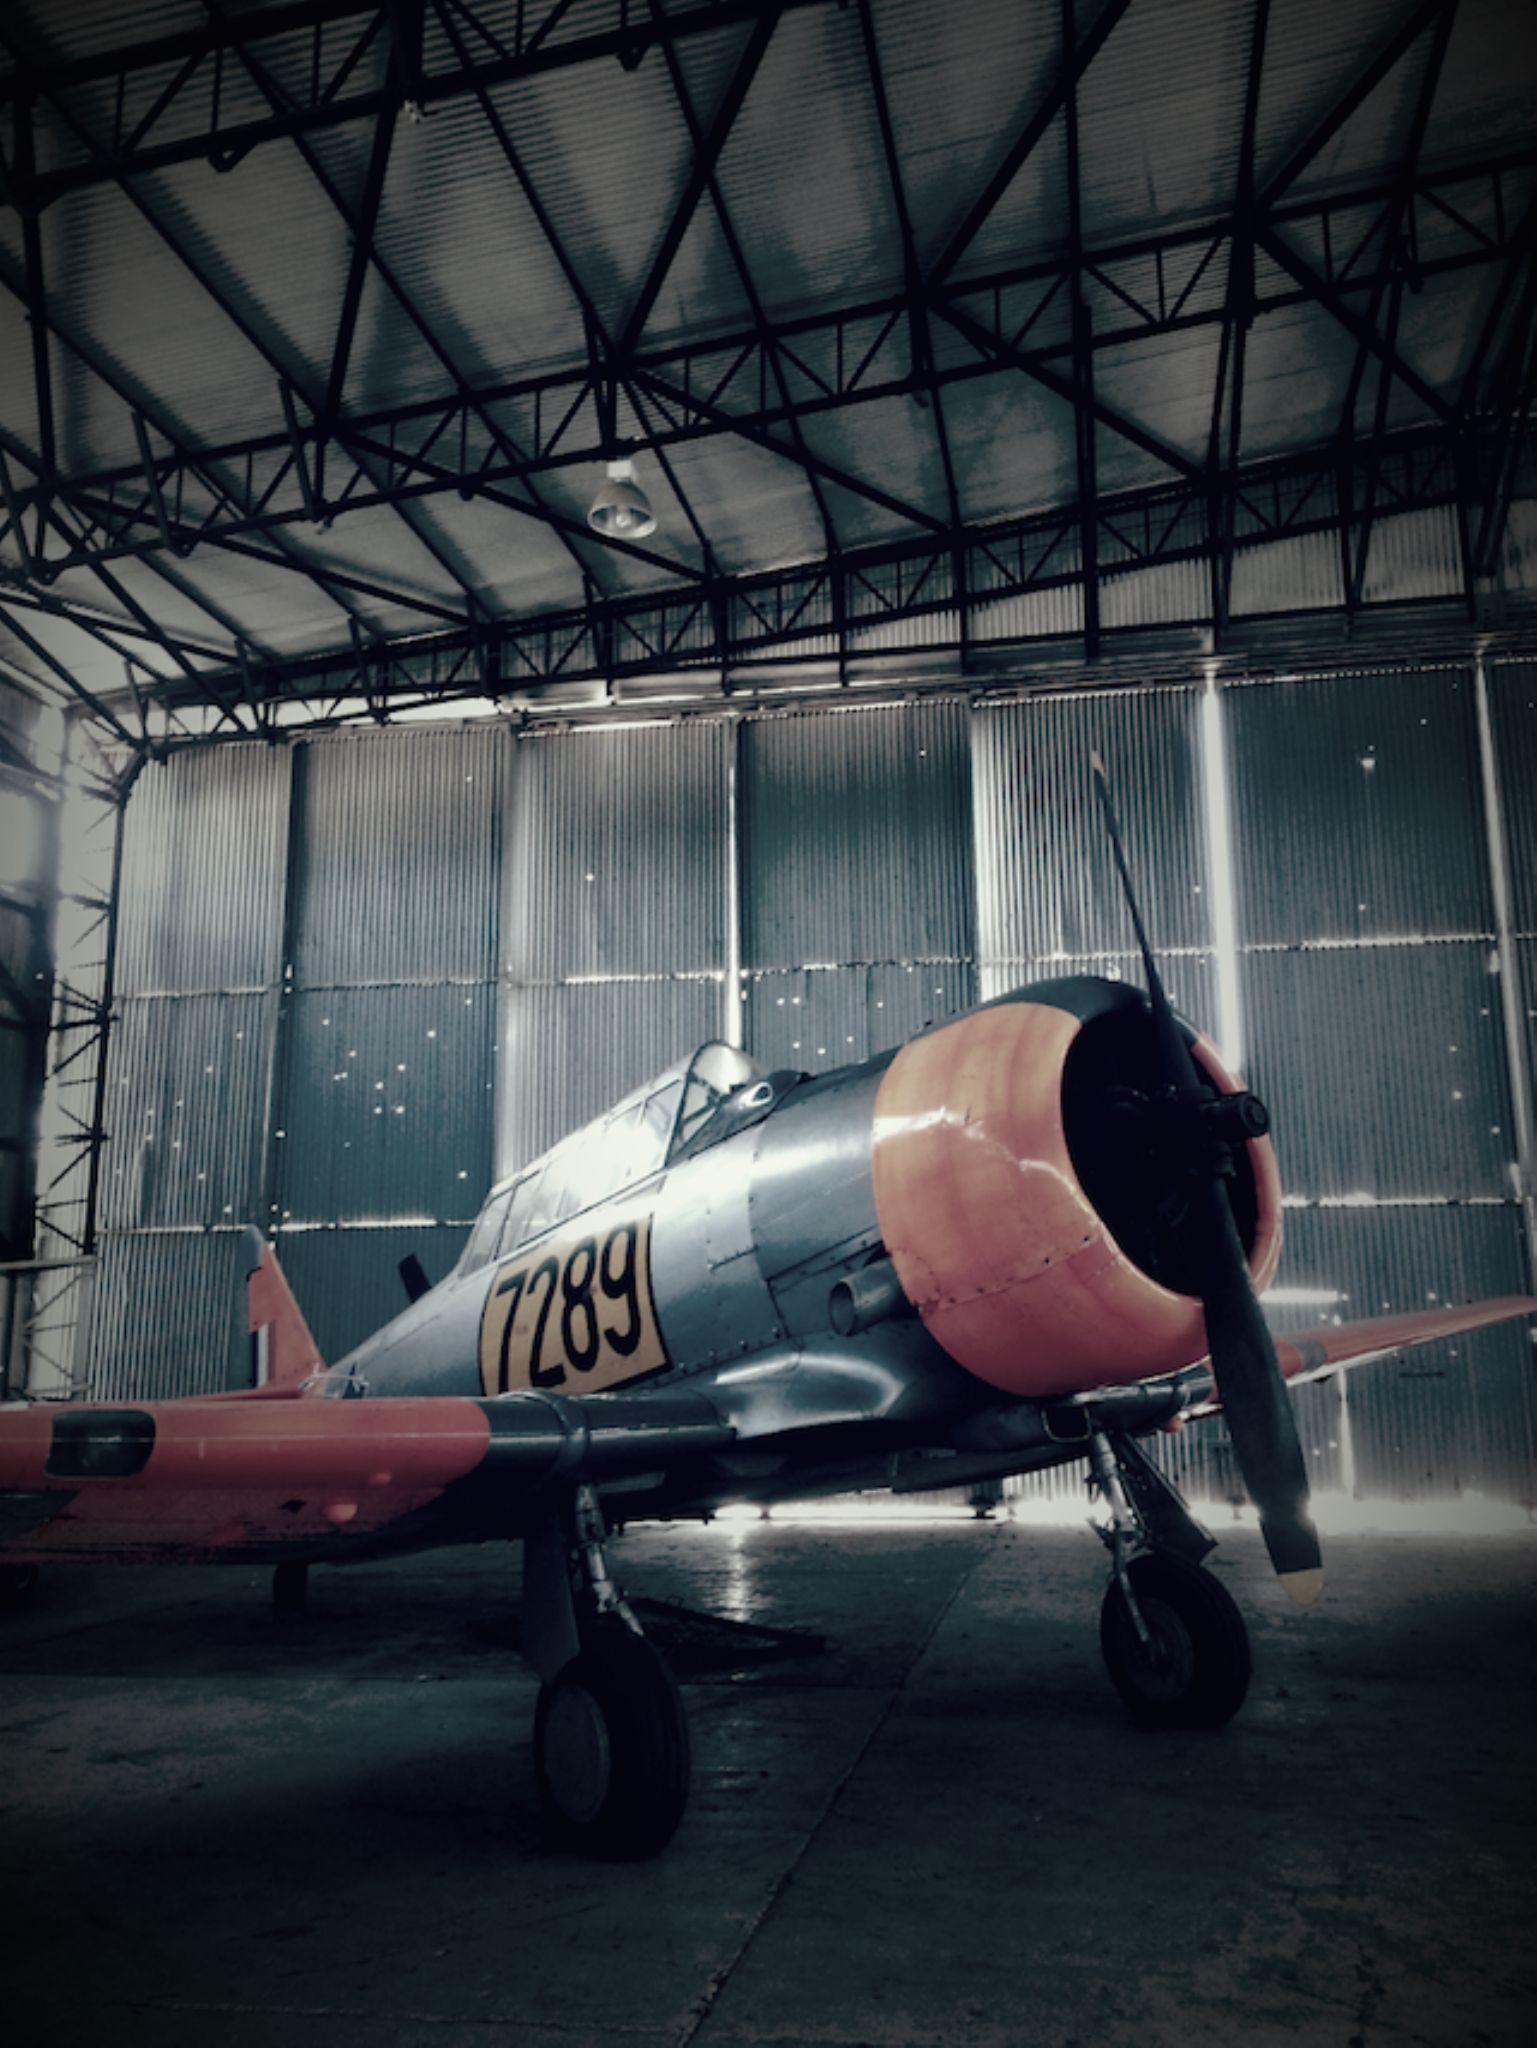 Mustang by kana.chan2